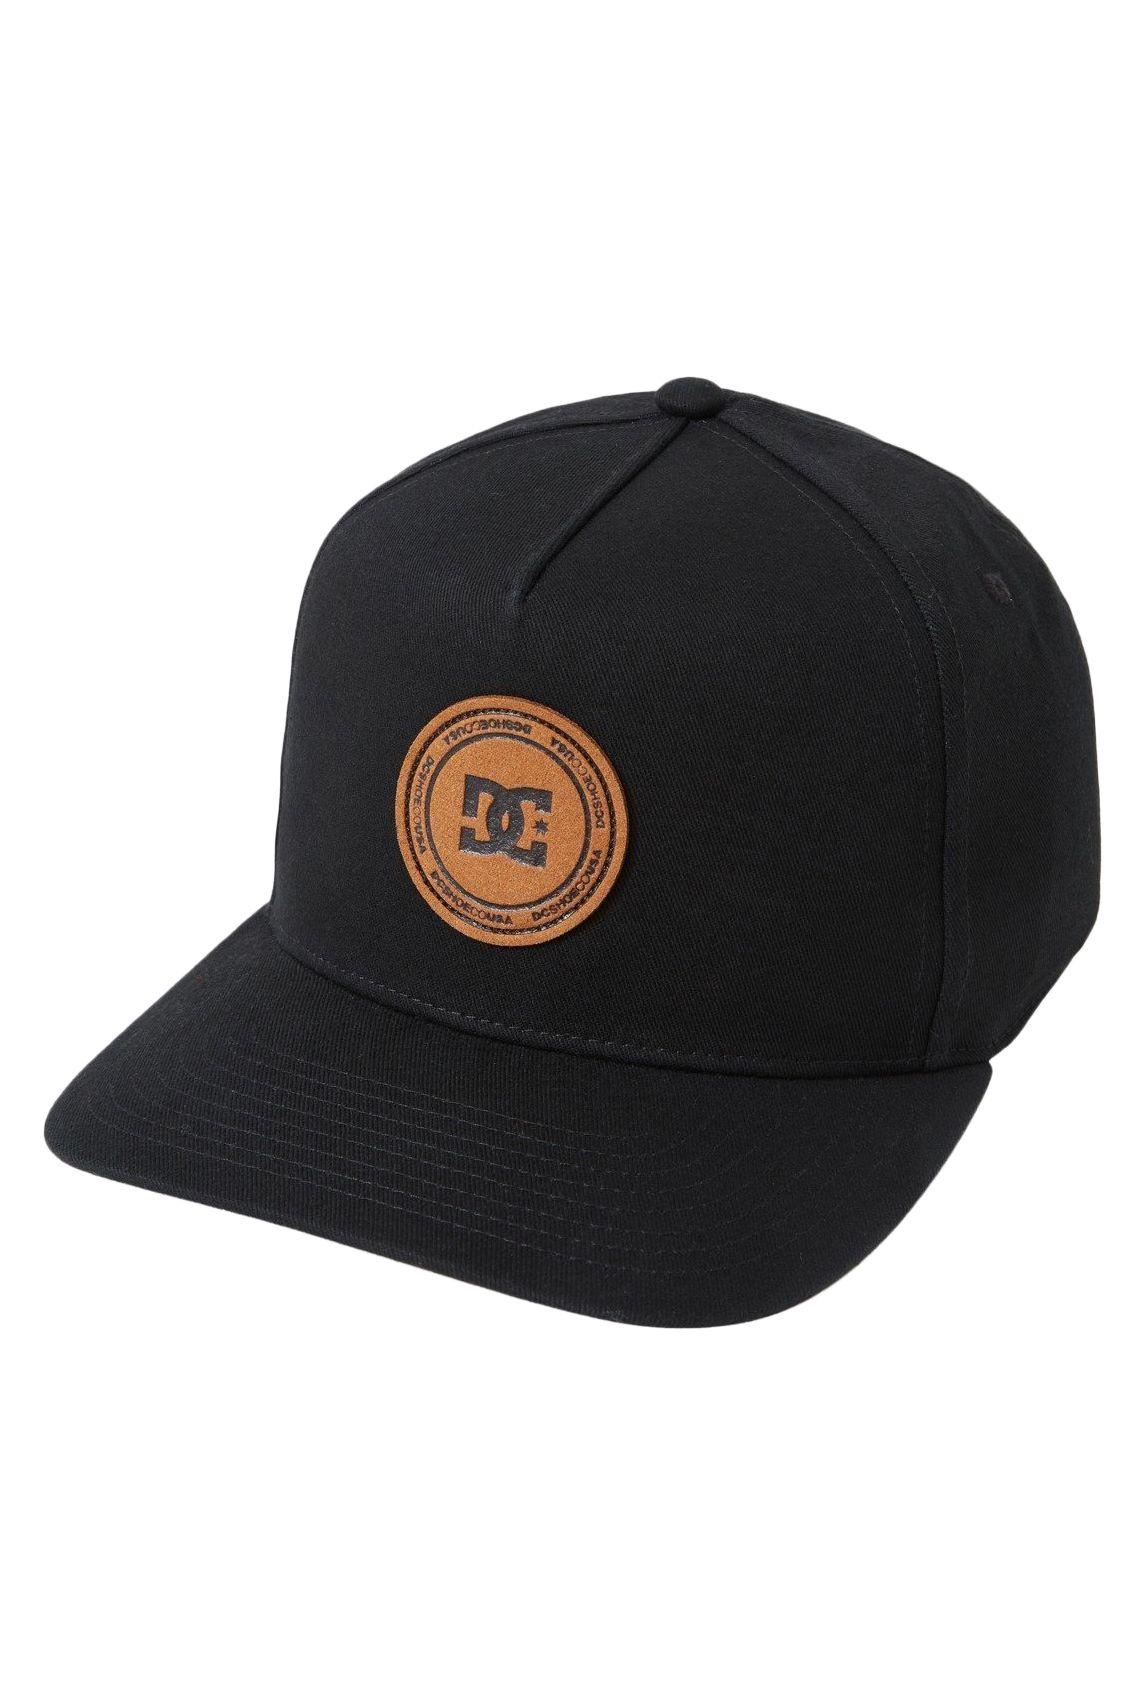 DC Shoes Cap   REYNOTTS 5 BOY Black